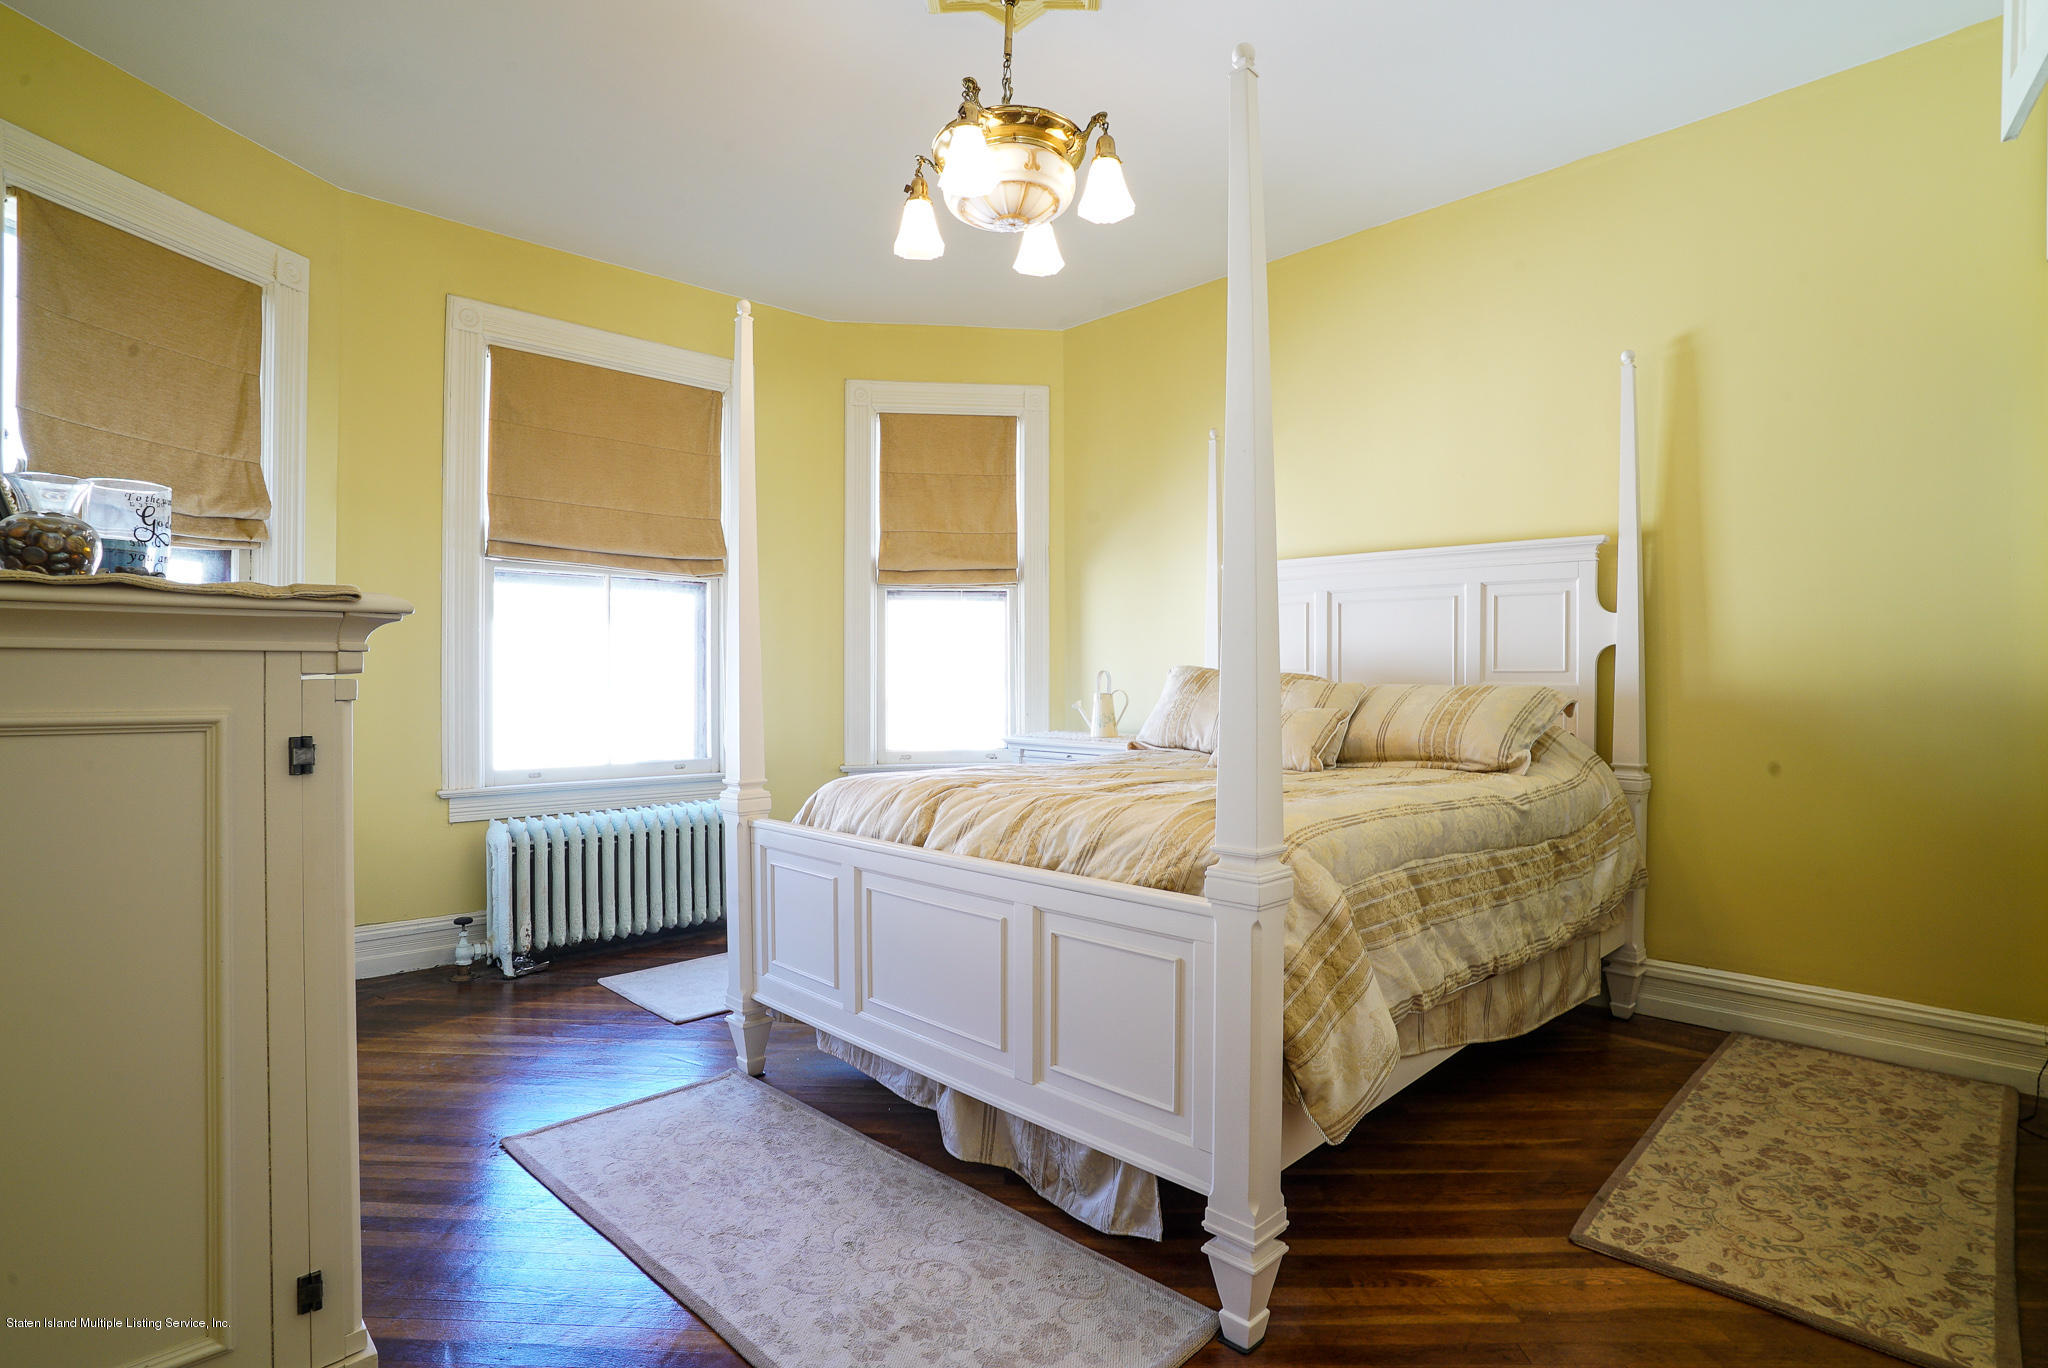 Single Family - Detached 309 Guyon Avenue  Staten Island, NY 10306, MLS-1142302-33